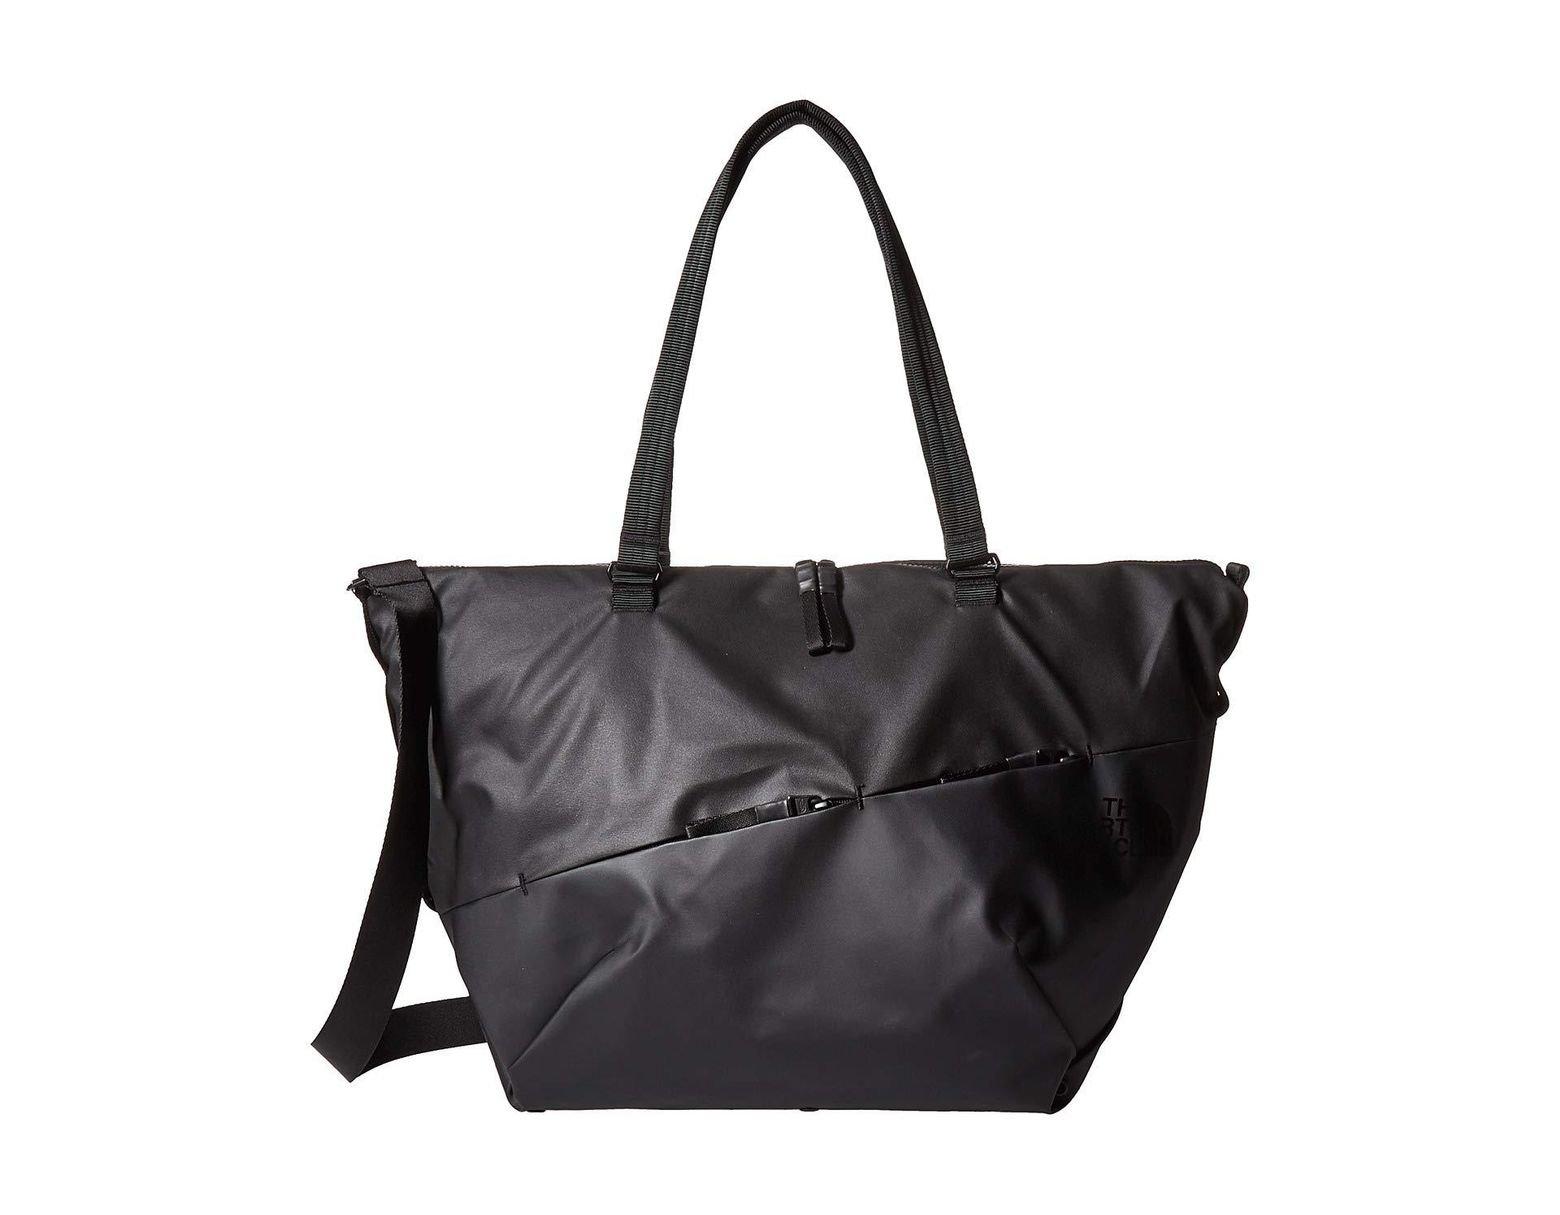 f1716875edfee The North Face Electra Tote Se - Large (rabbit Grey rabbit Grey Copper  Melange) Tote Handbags in Black - Lyst